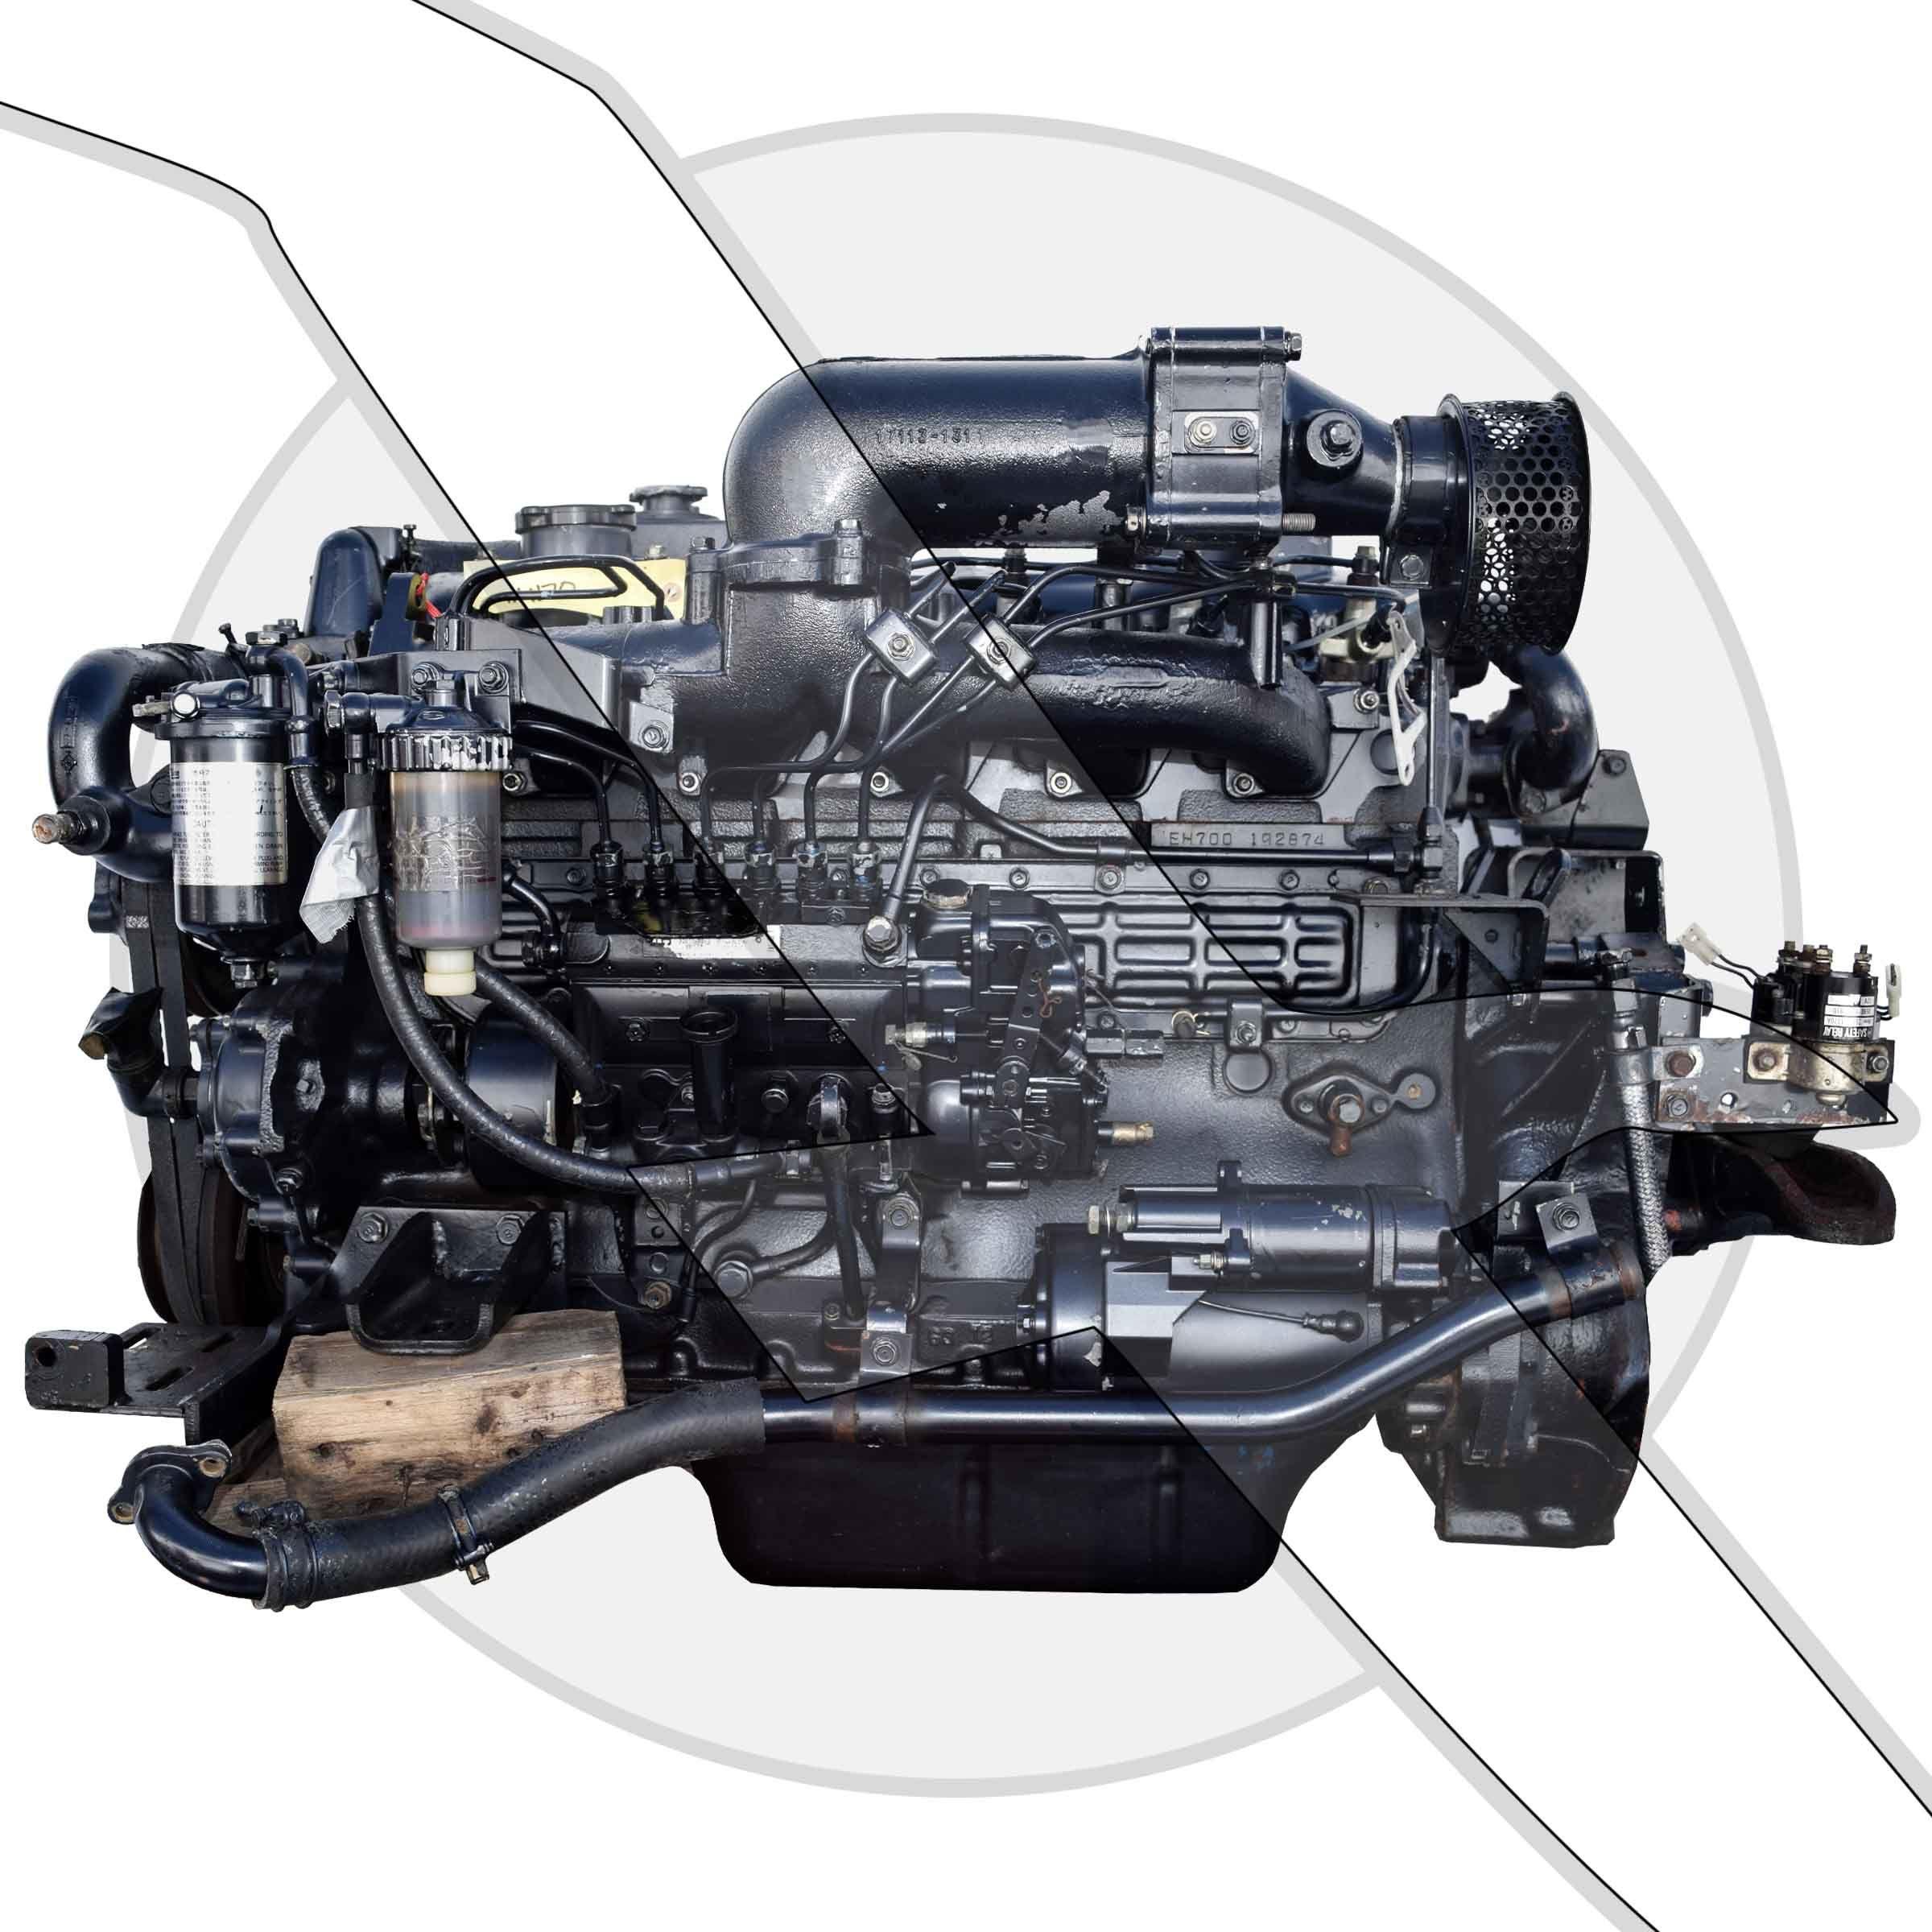 Mercruiser 6 4l 393ci Eh700 6 Cyl Hino Diesel Engine